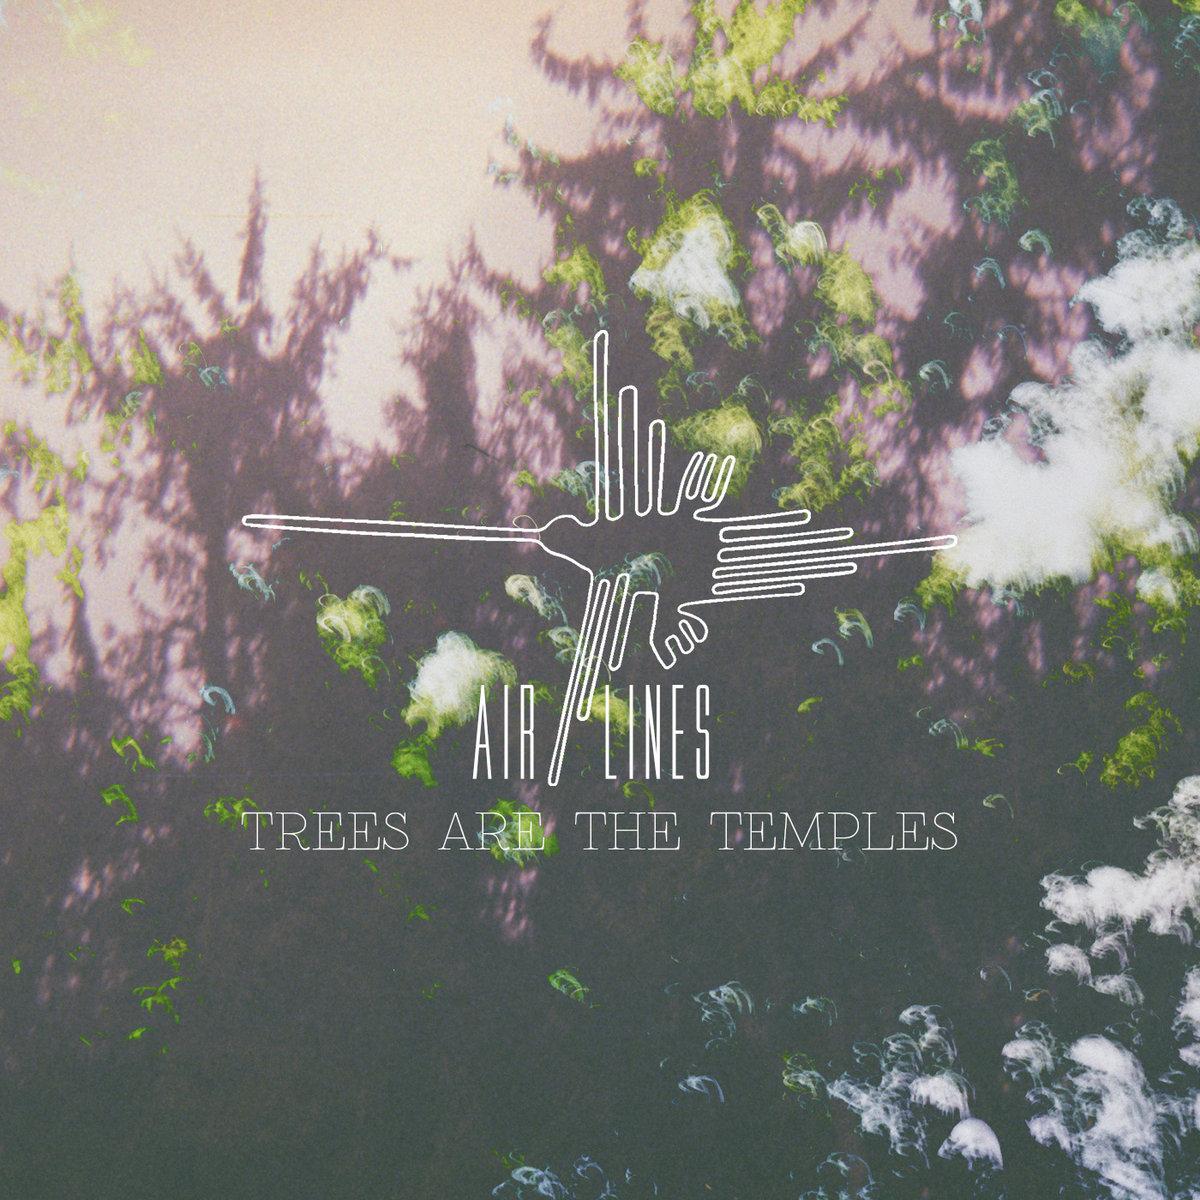 "Air Lines, proiect muzical românesc de post-punk & industrial, a lansat videoclipul ""Trees are the Temples"""